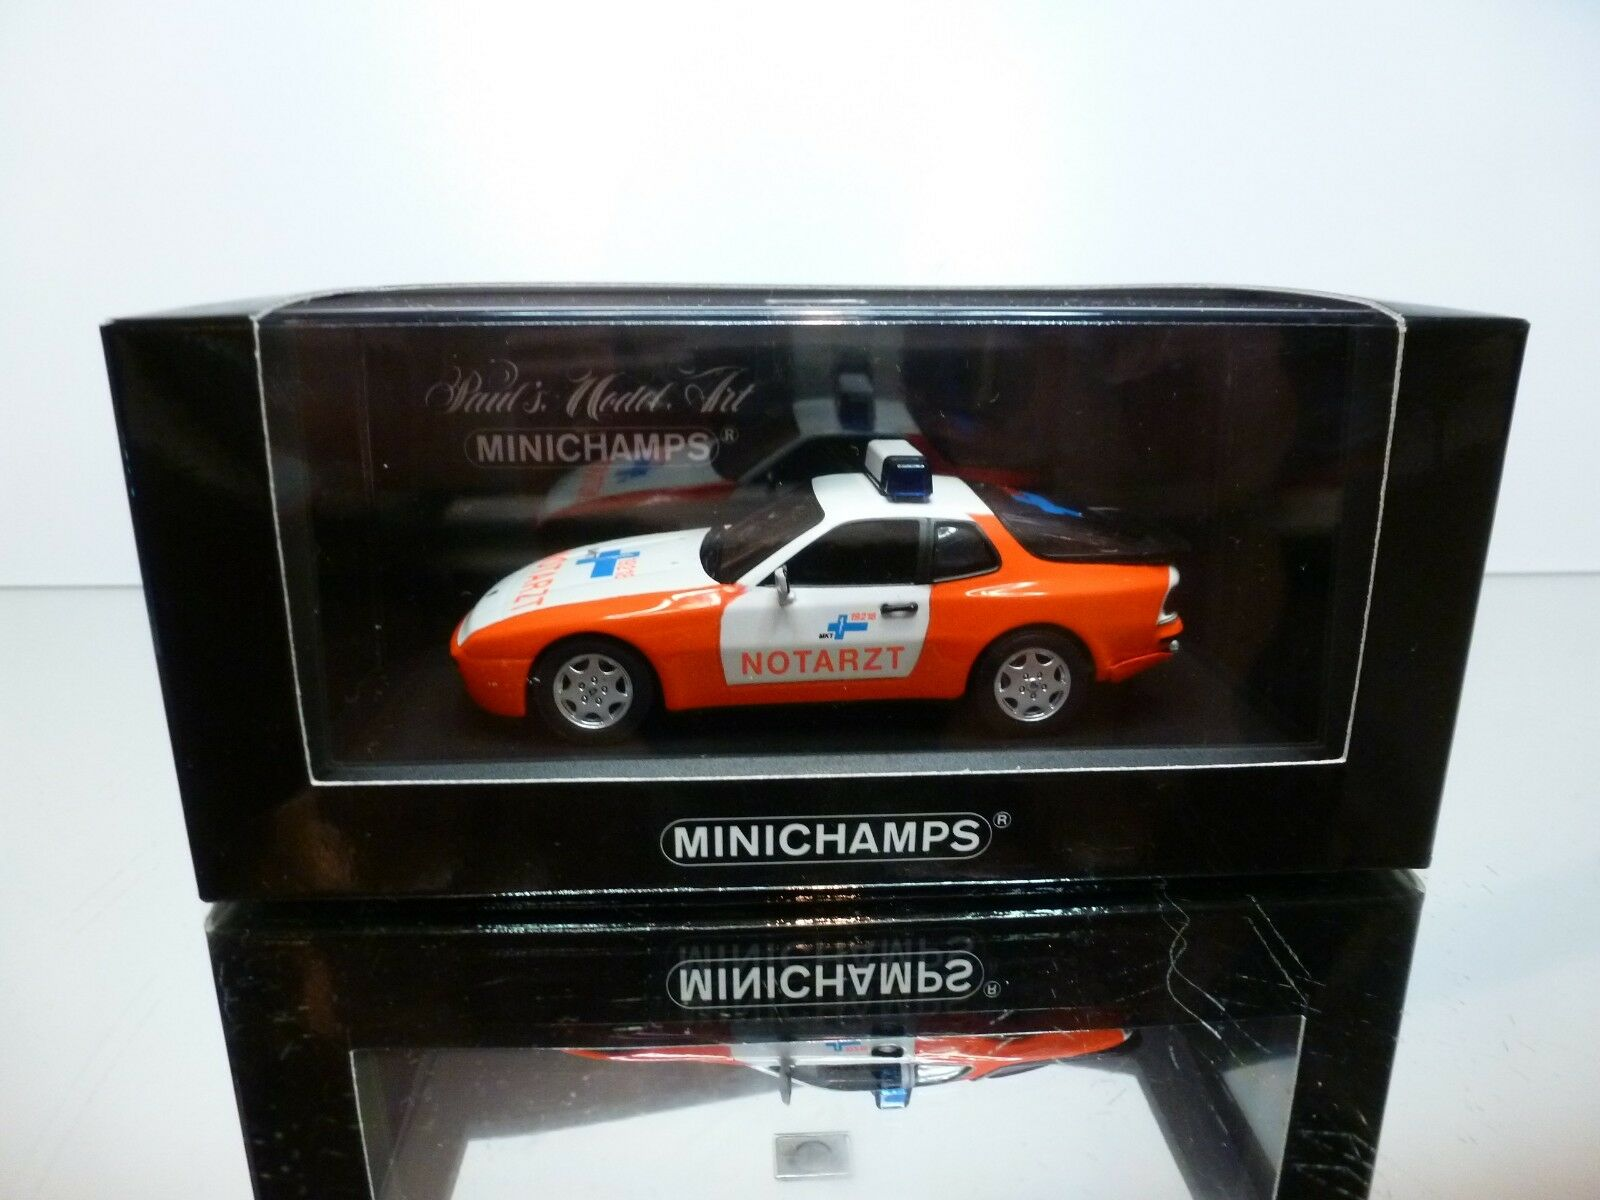 MINICHAMPS 62290 PORSCHE 944 S2 1995 NOTARZT - PROMO 1 43 - EXCELLENT IN BOX